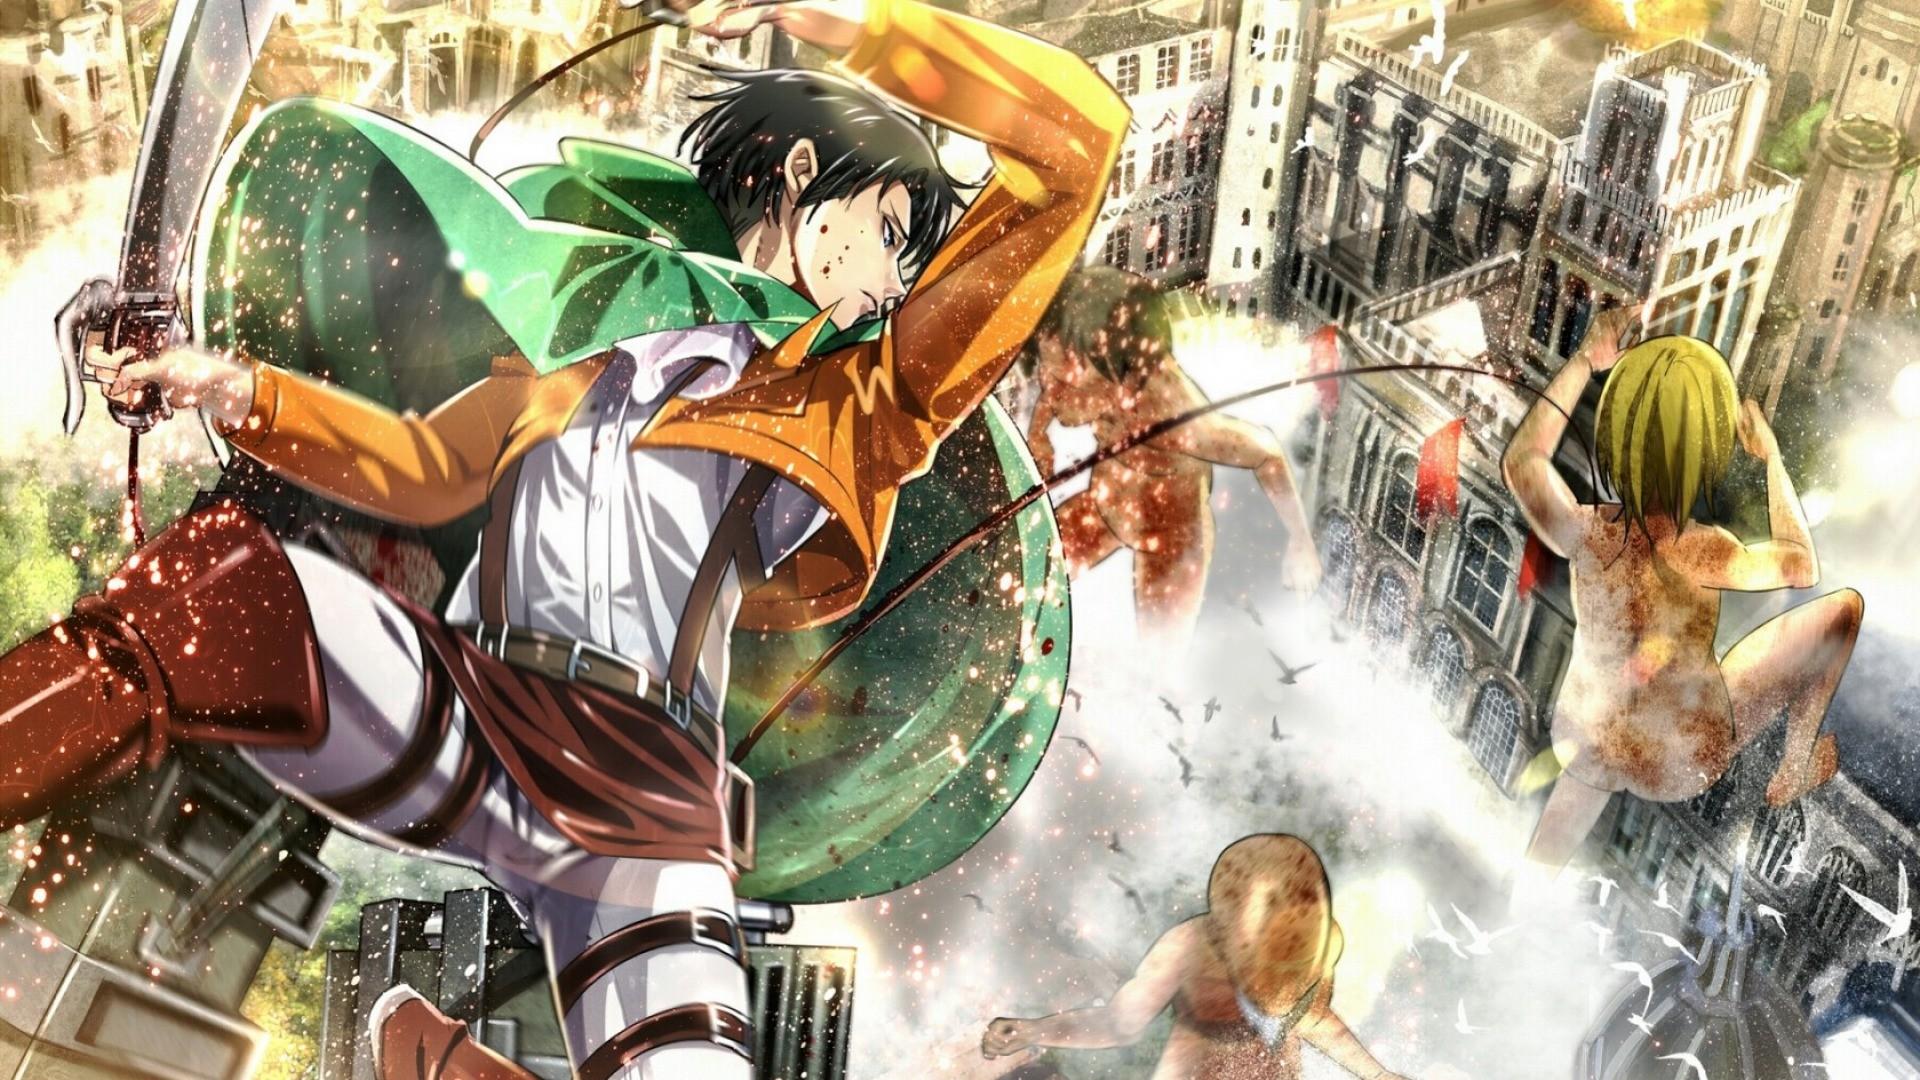 Wallpaper Anime Shingeki No Kyojin Comics Mythology